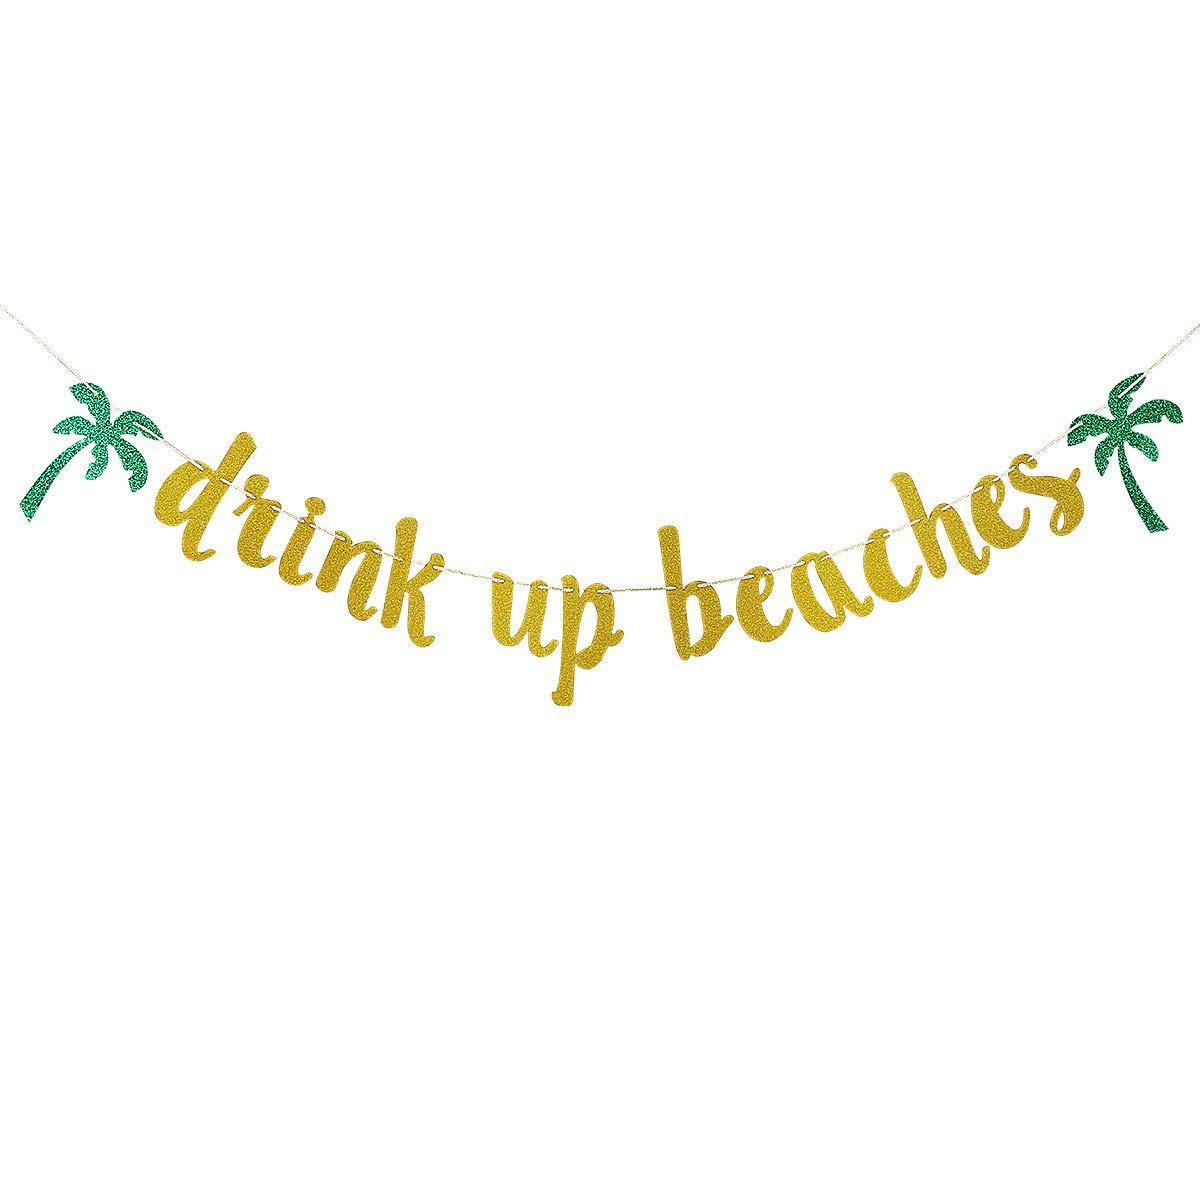 Drink Up Beaches Banner Gold Glitter- Beach Party Decorations, Drink Up Beaches Decorations, Tropical Bachelorette Party Decor, Hawaiian Bridal Shower Decorations